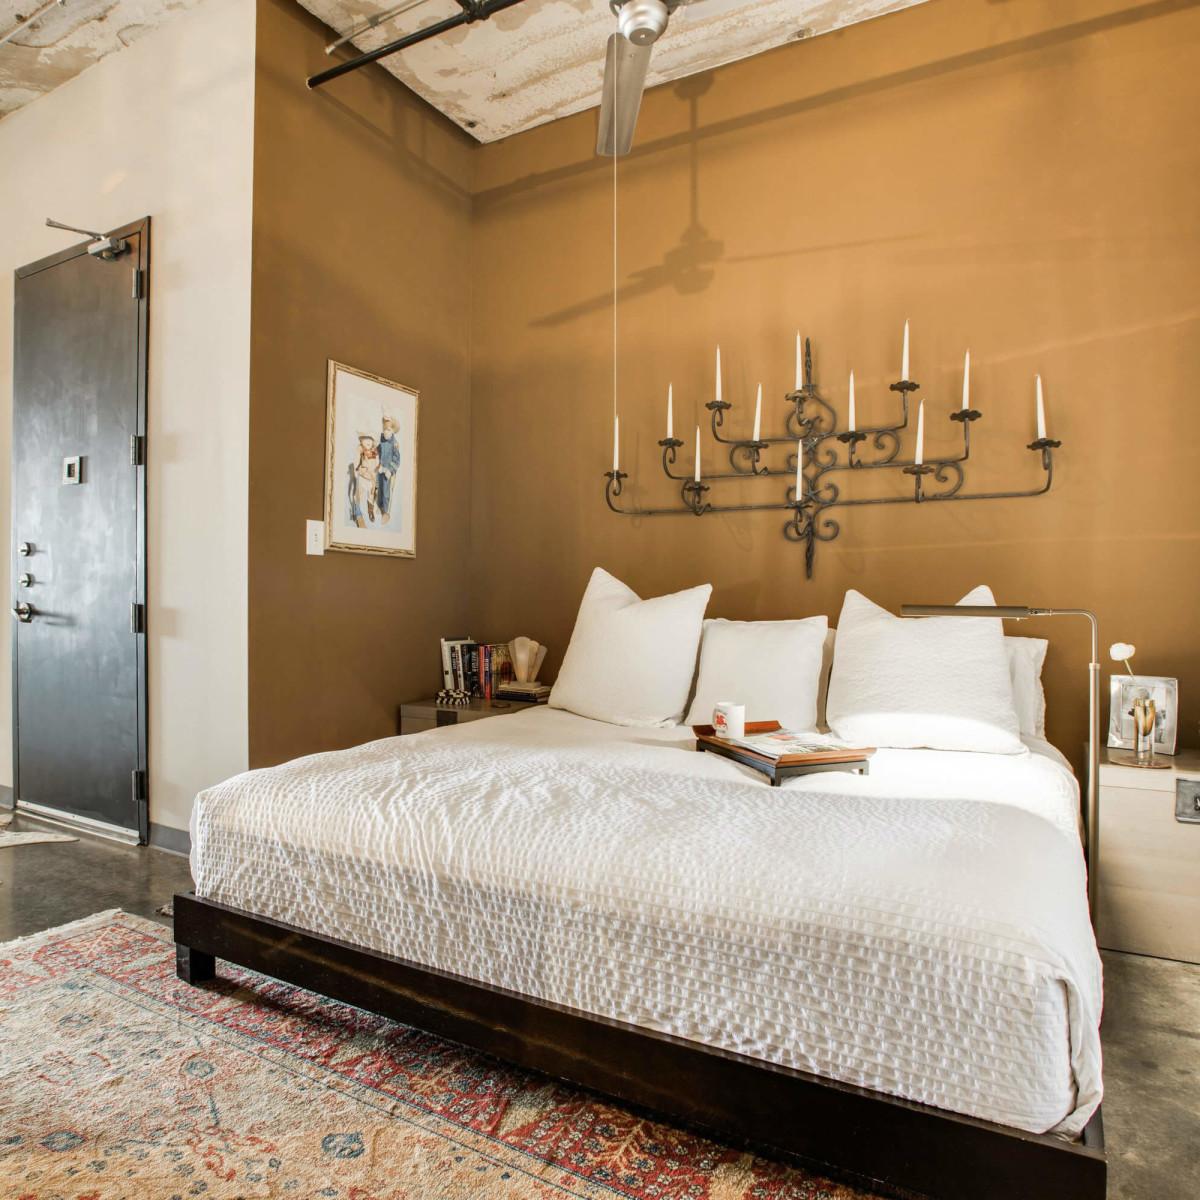 Bedroom at 1122 Jackson St. in Dallas